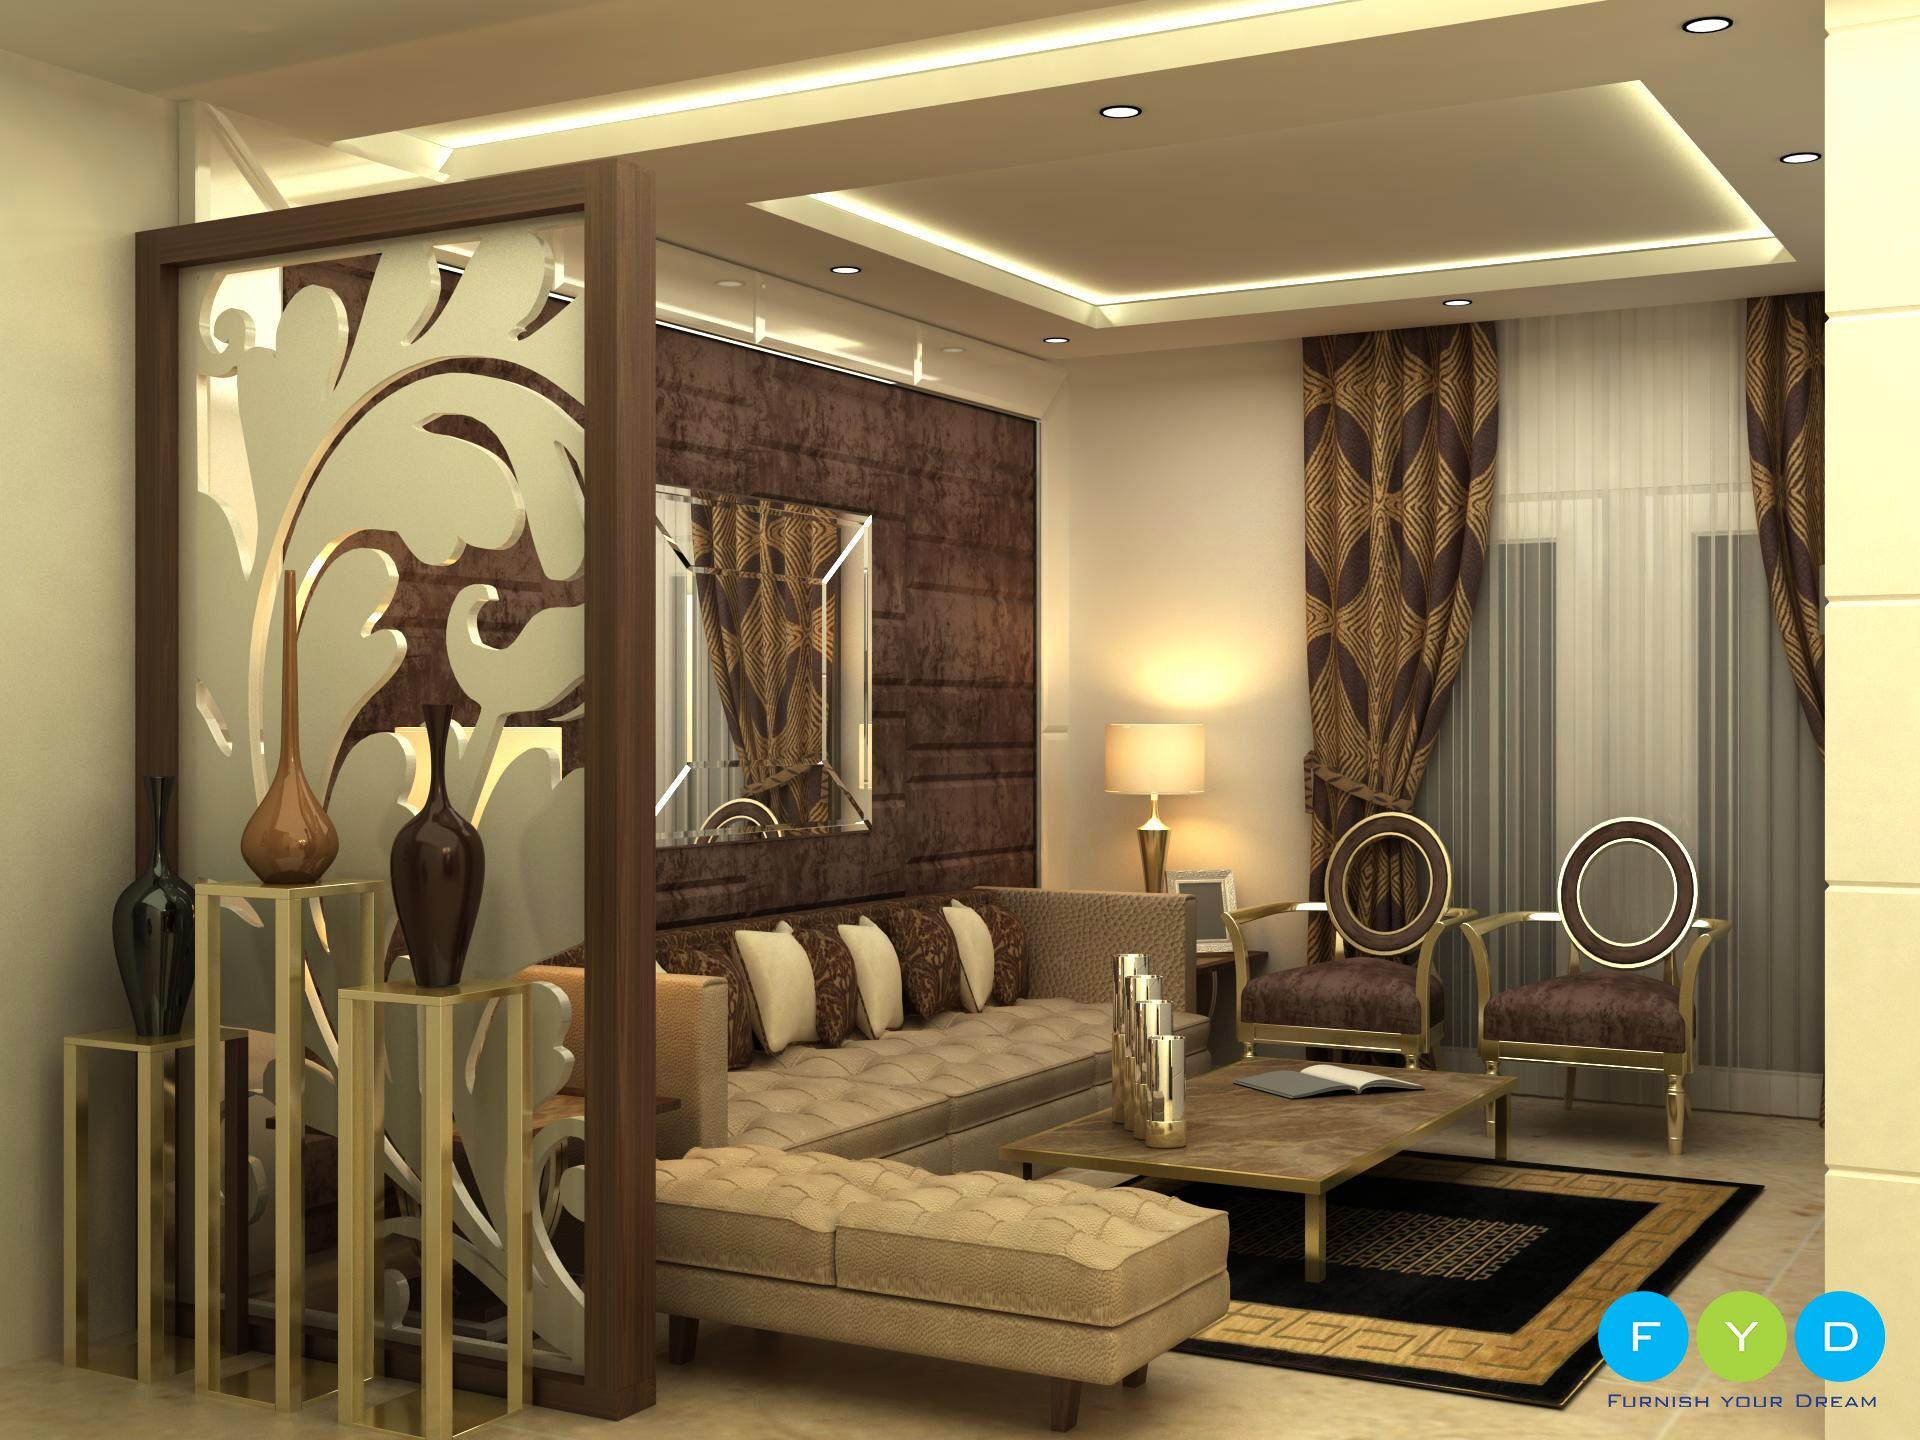 Design Shapes The Way We Live Interiordesign Interiordesigners